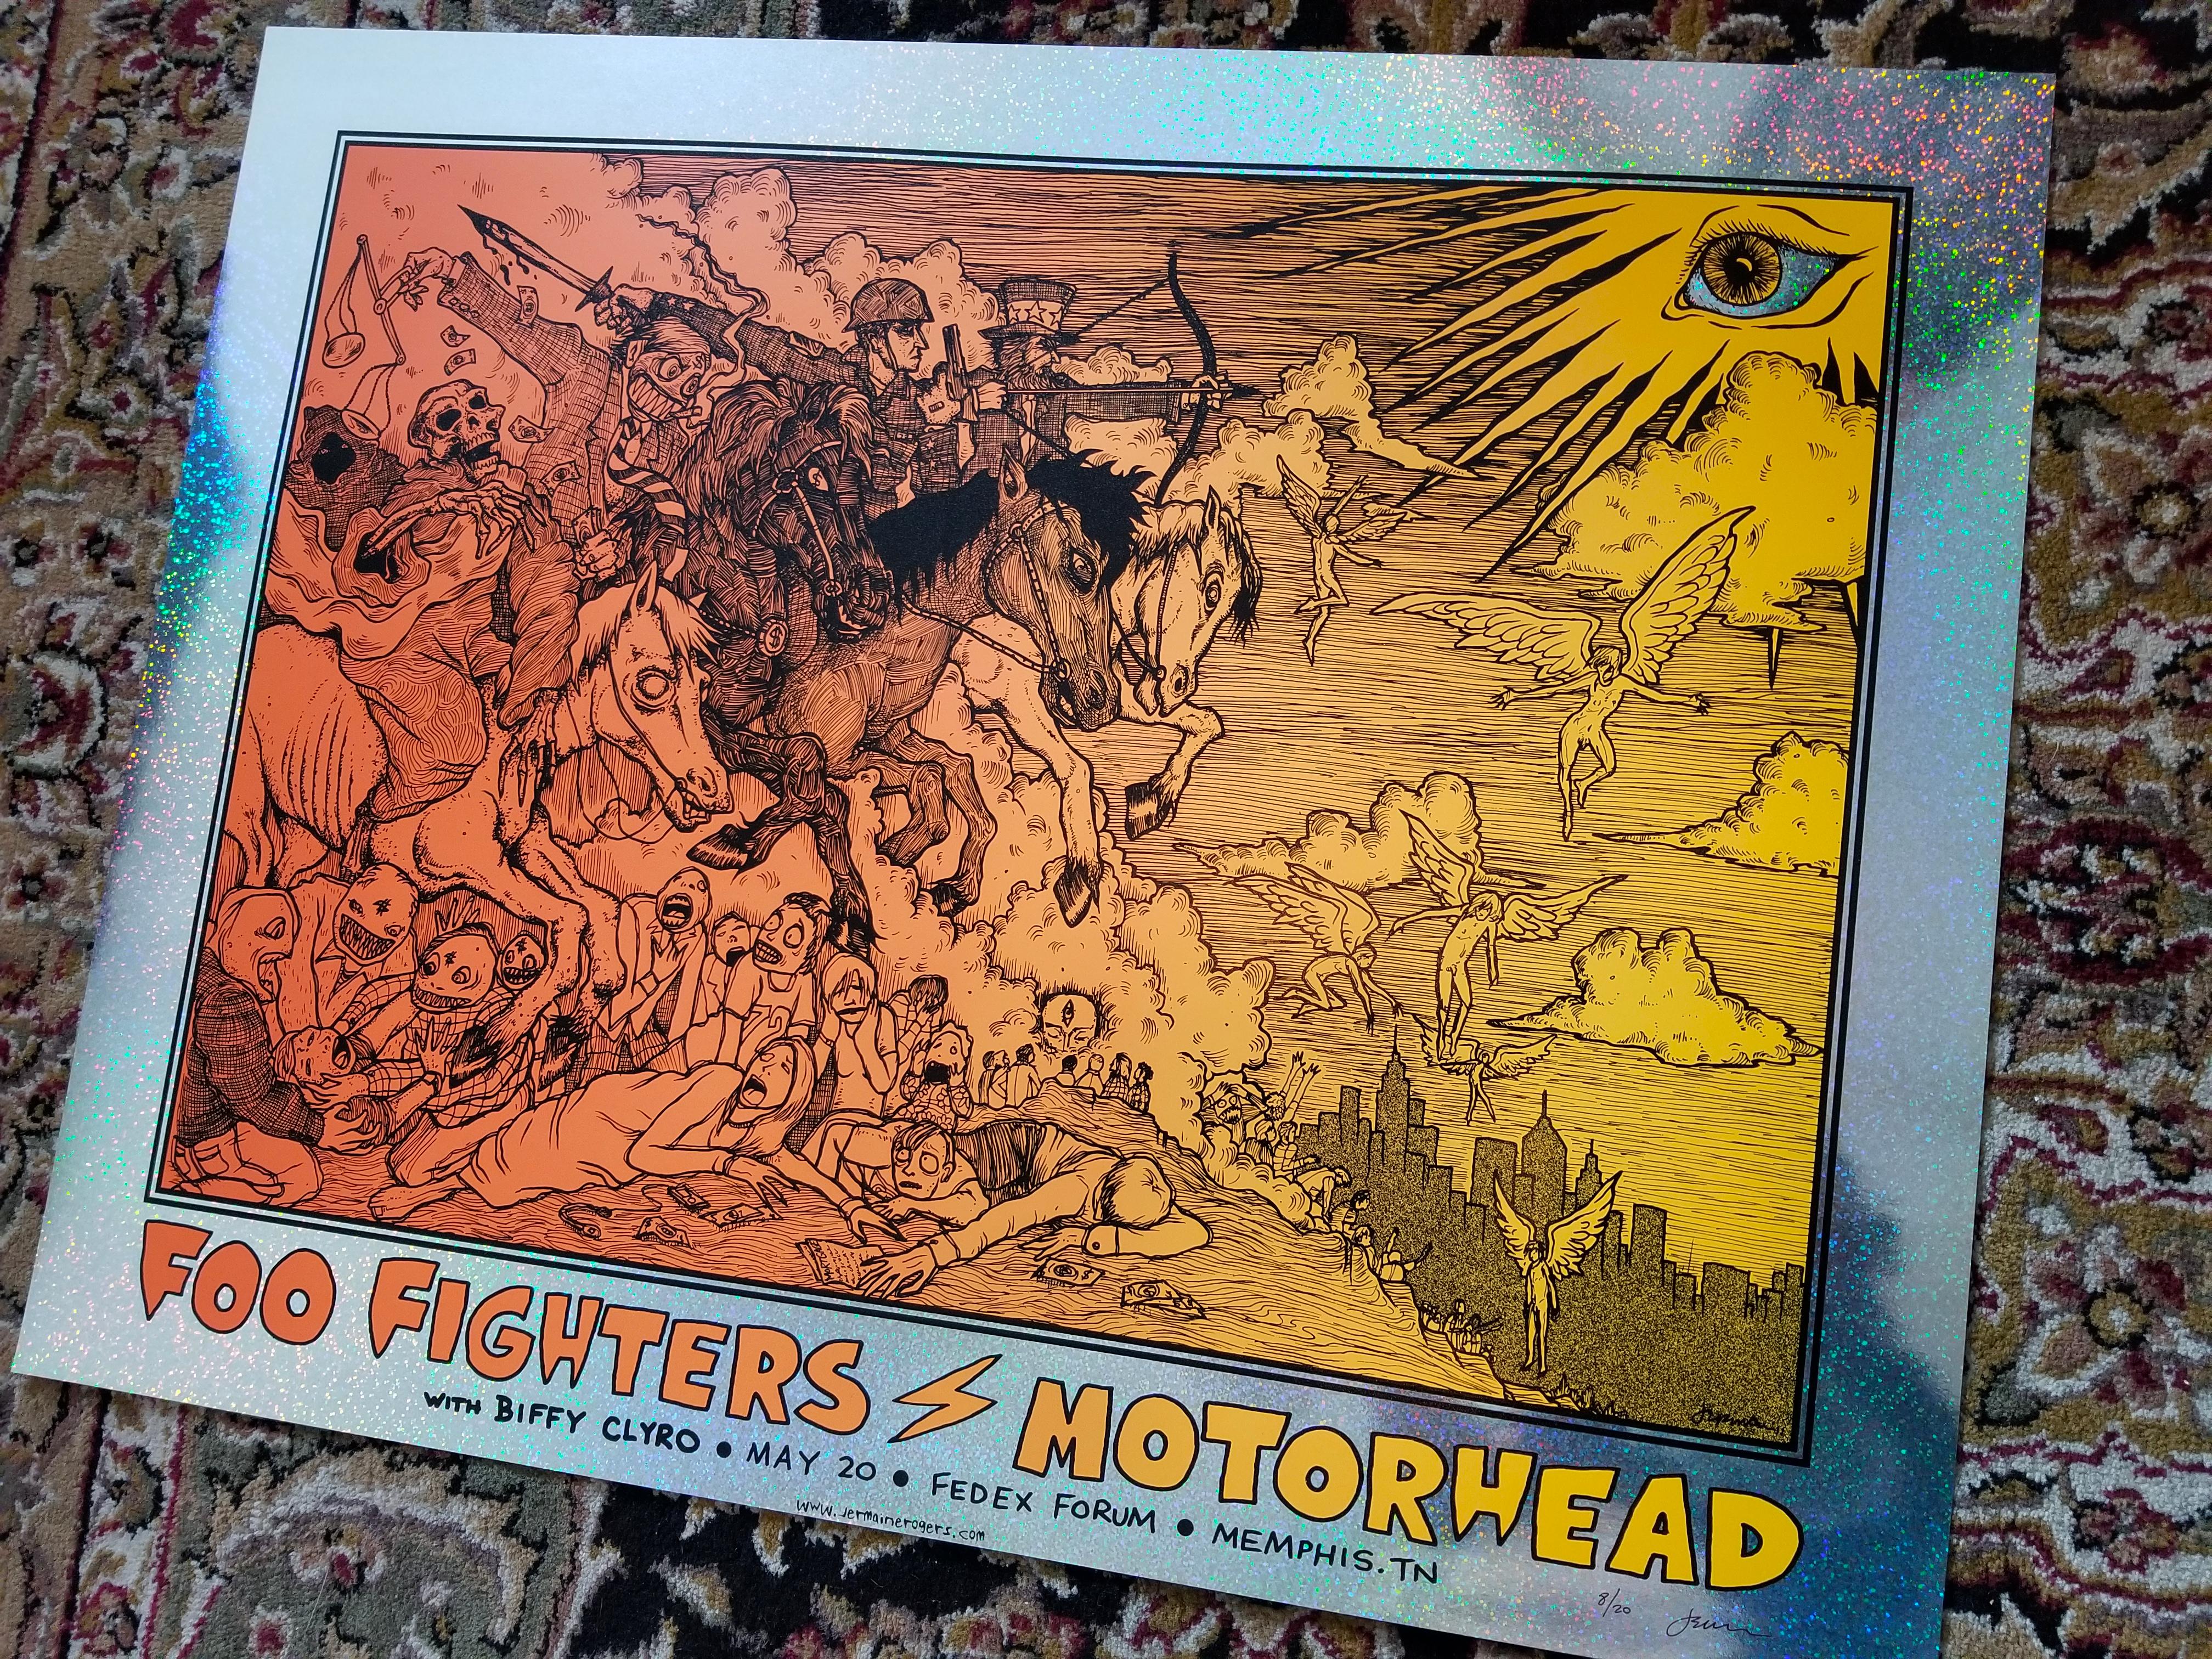 FOO FIGHTERS / MOTORHEAD (HOLOGRAPHIC Sparkle Foil Variant) 2011